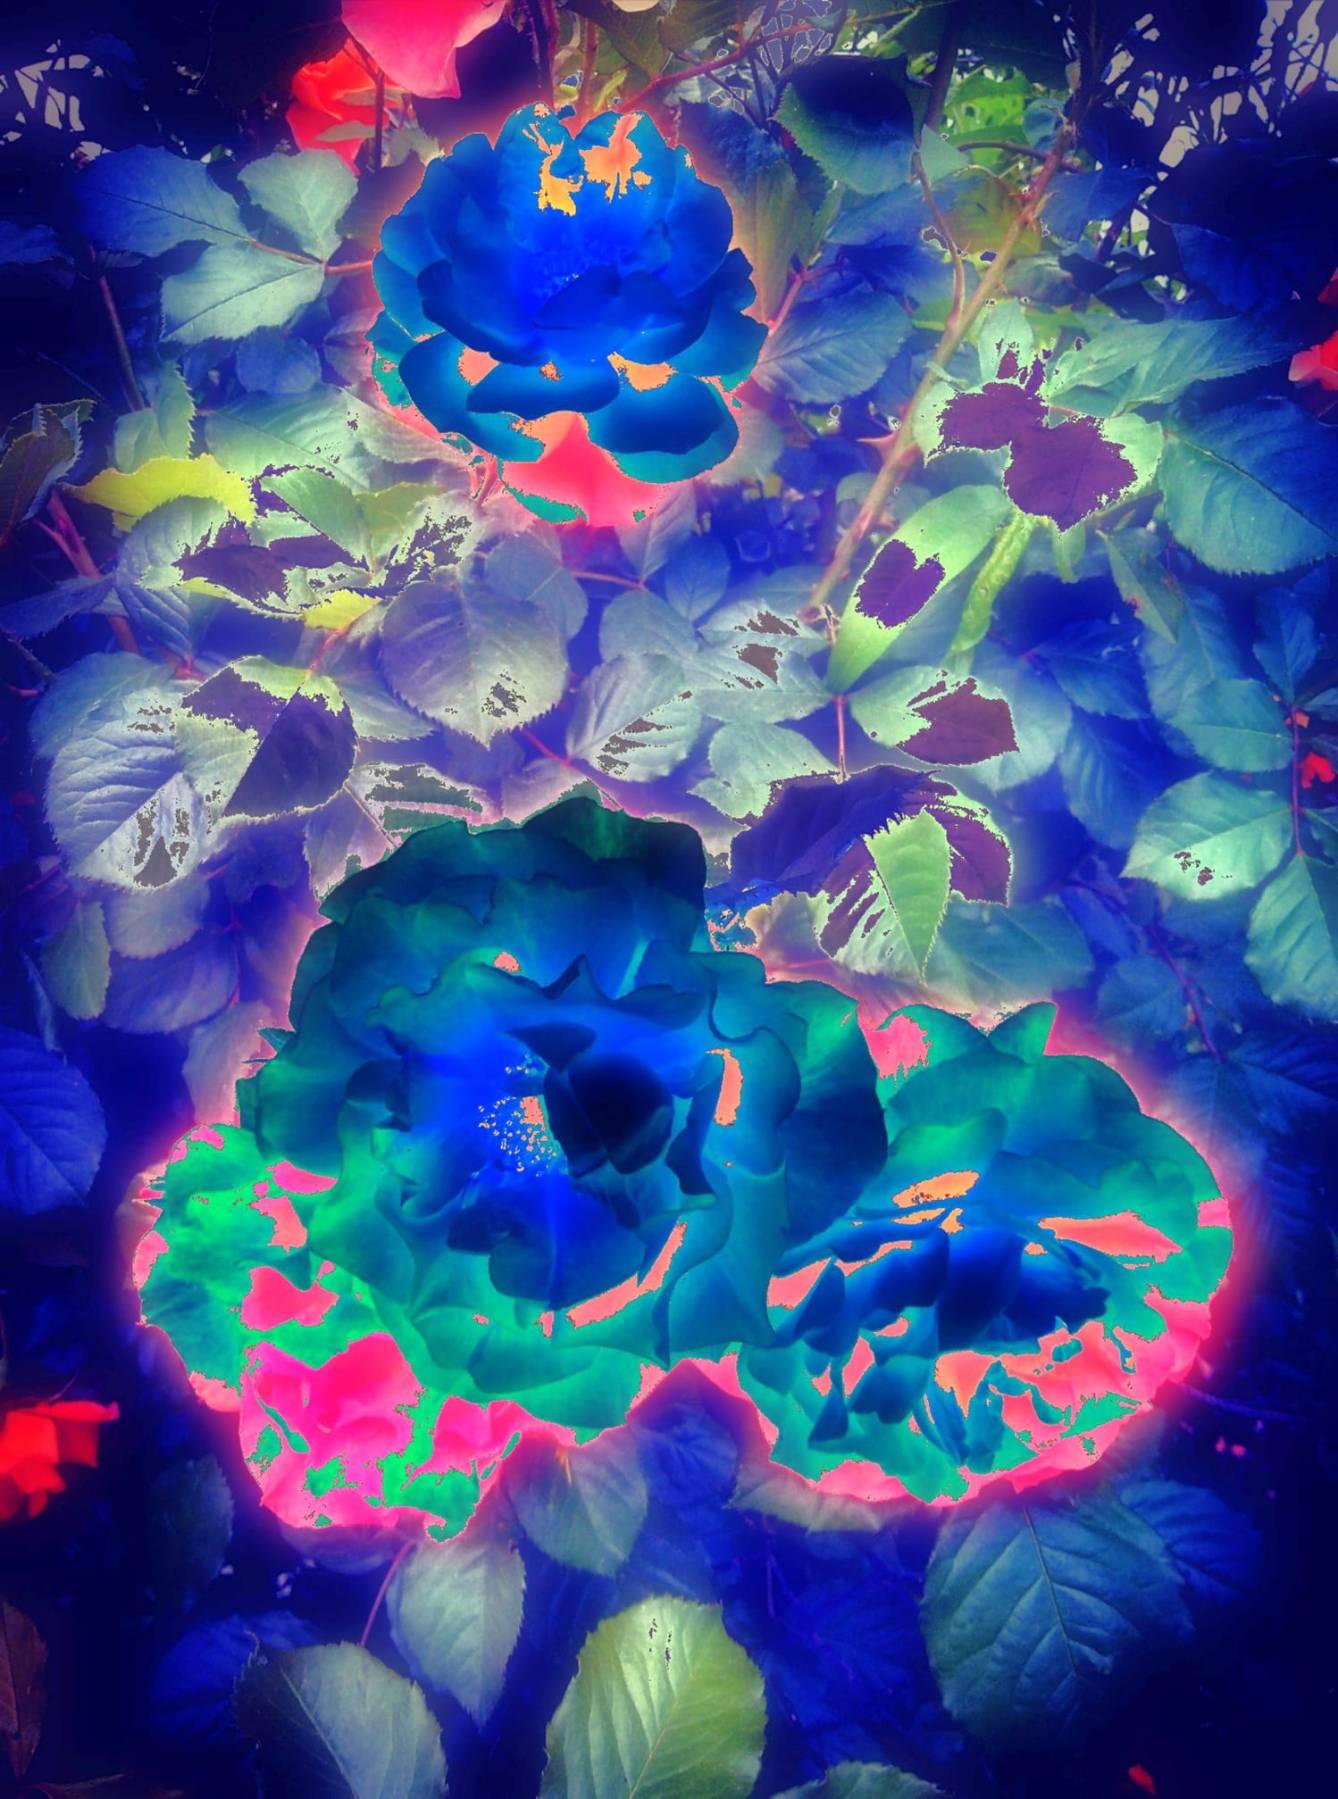 If the roses were blue - Digital Work - Miroslava Panayotova